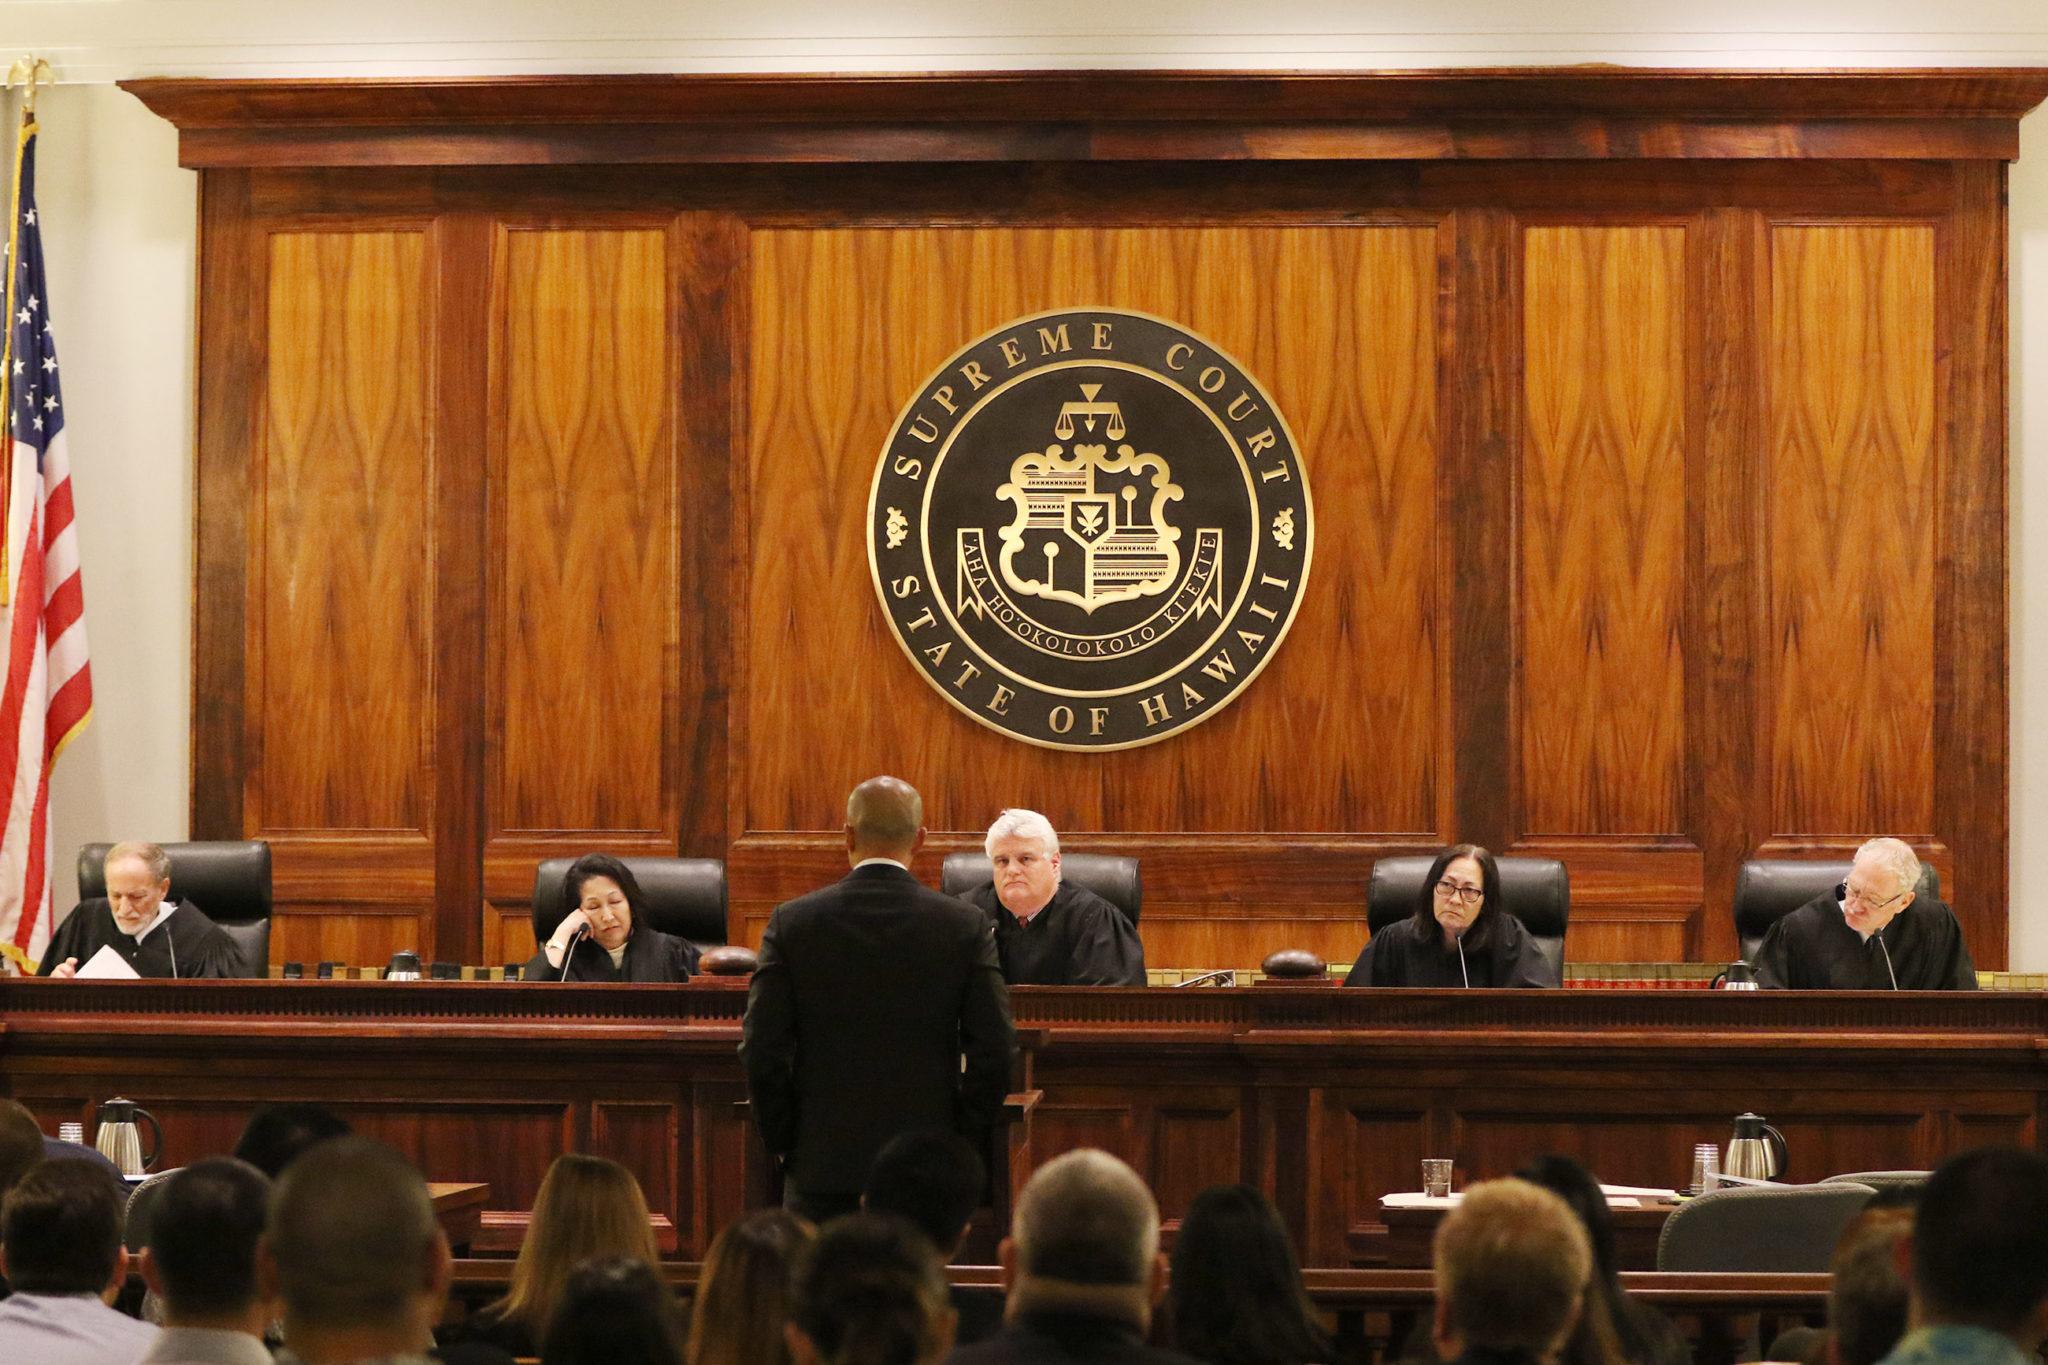 Deedy Trial Hawaii Supreme Court Otake addresses justices. 2 feb 2016